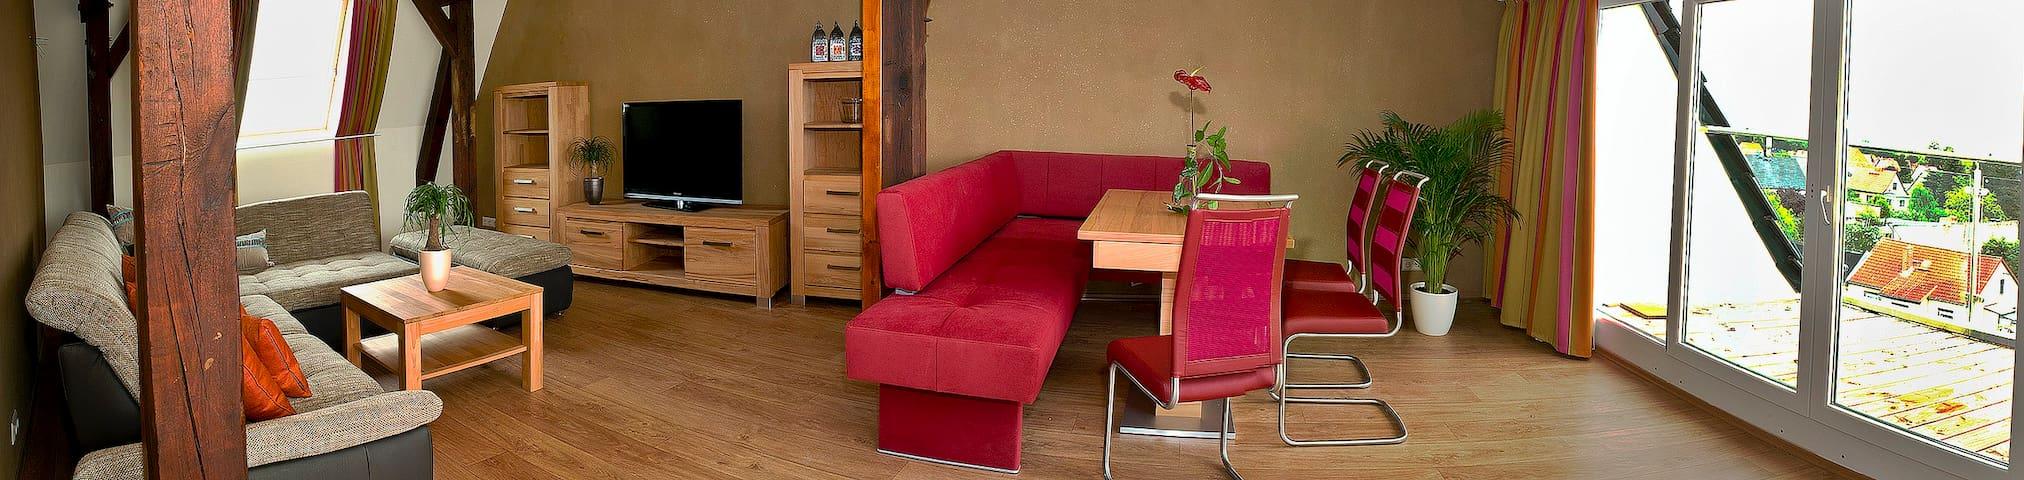 Suite SONN'IDYLL - Rathenow - Bed & Breakfast